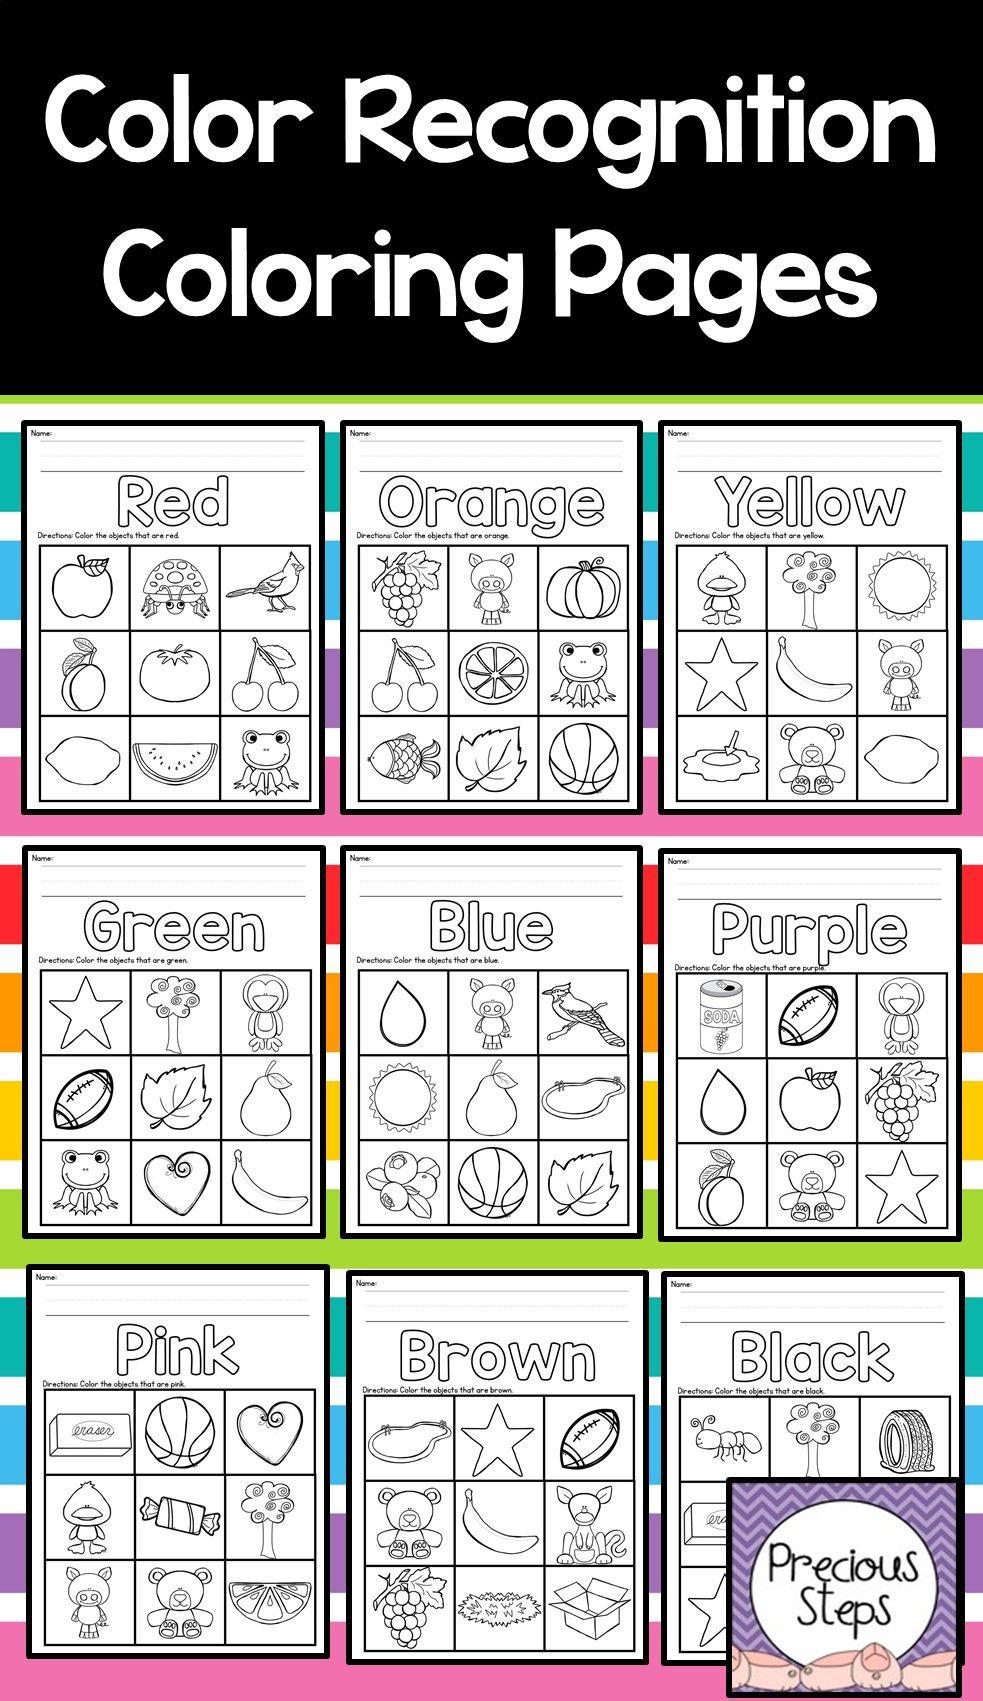 Color Recognition Coloring Sheets For Preschool Or Kindergarten Color Worksheets For Preschool Preschool Colors Teaching Colors [ 1701 x 983 Pixel ]